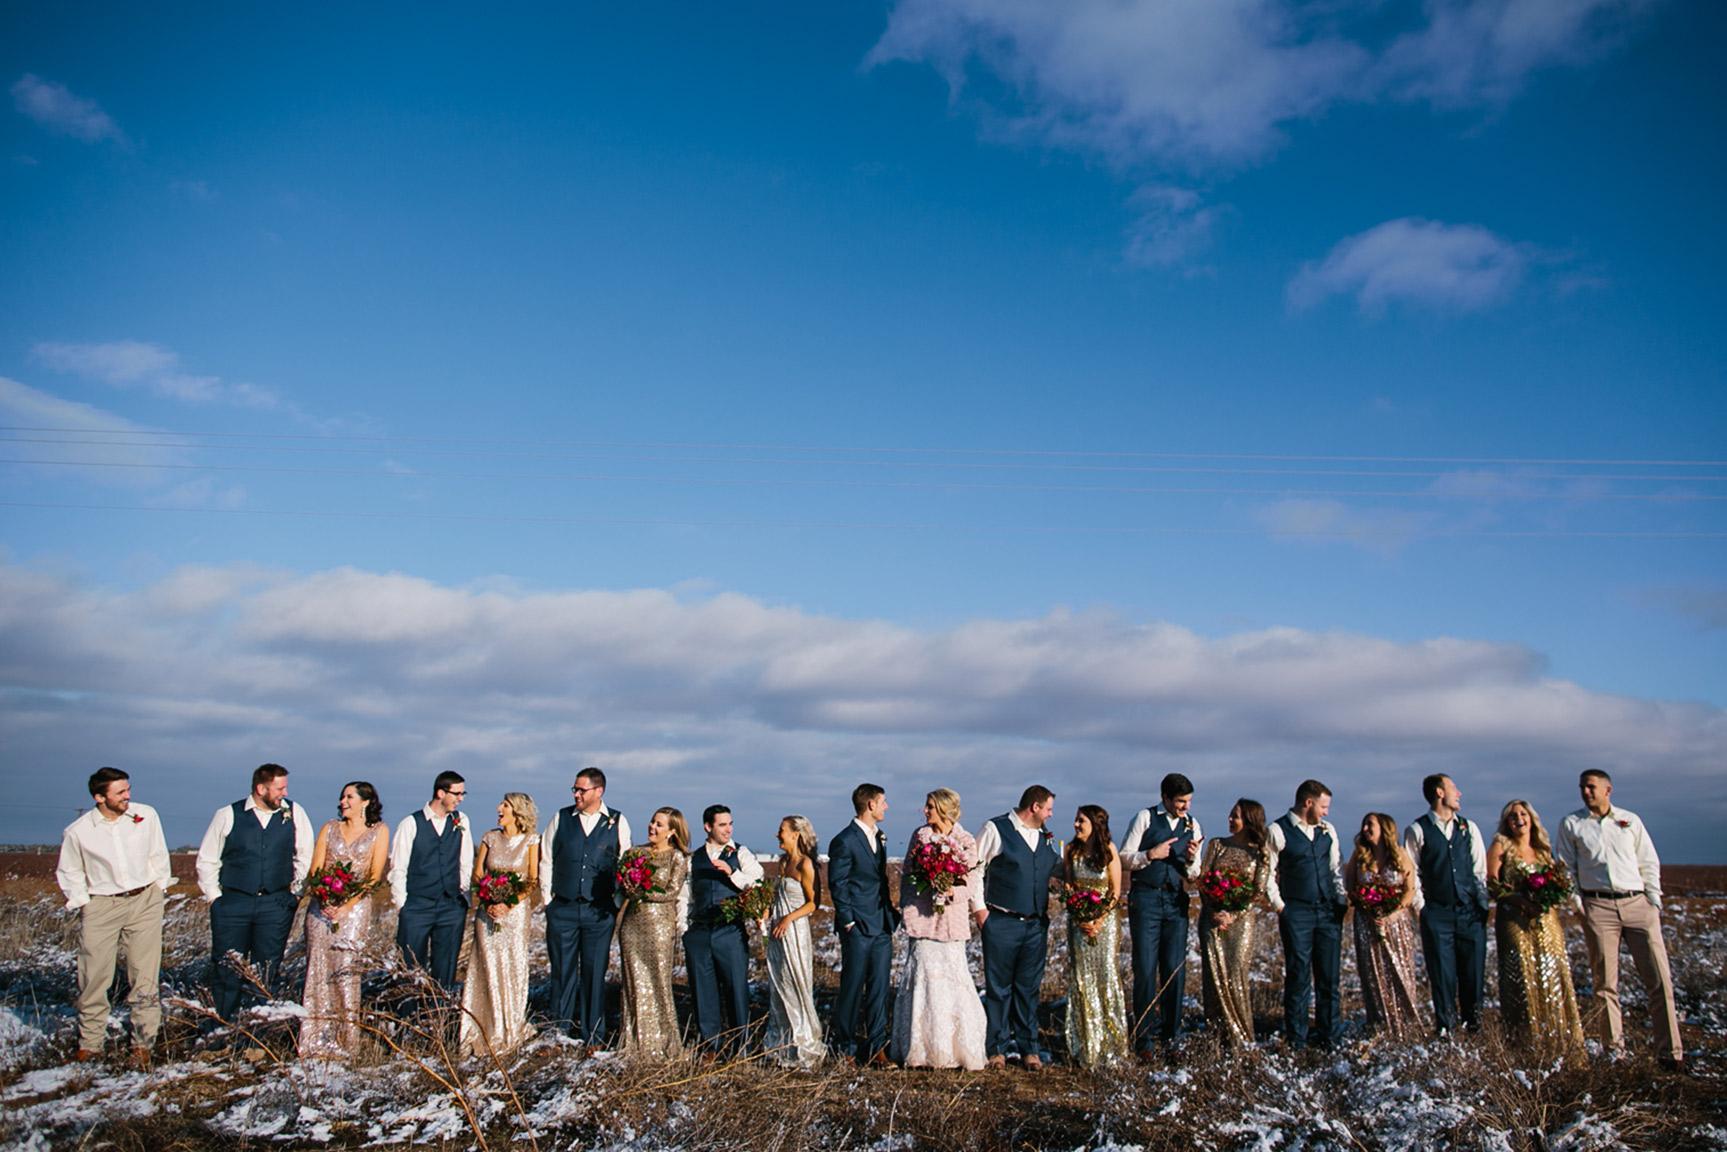 Cotton_Creek_Barn_Winter_Wedding_WeddingPhotographer038.jpg